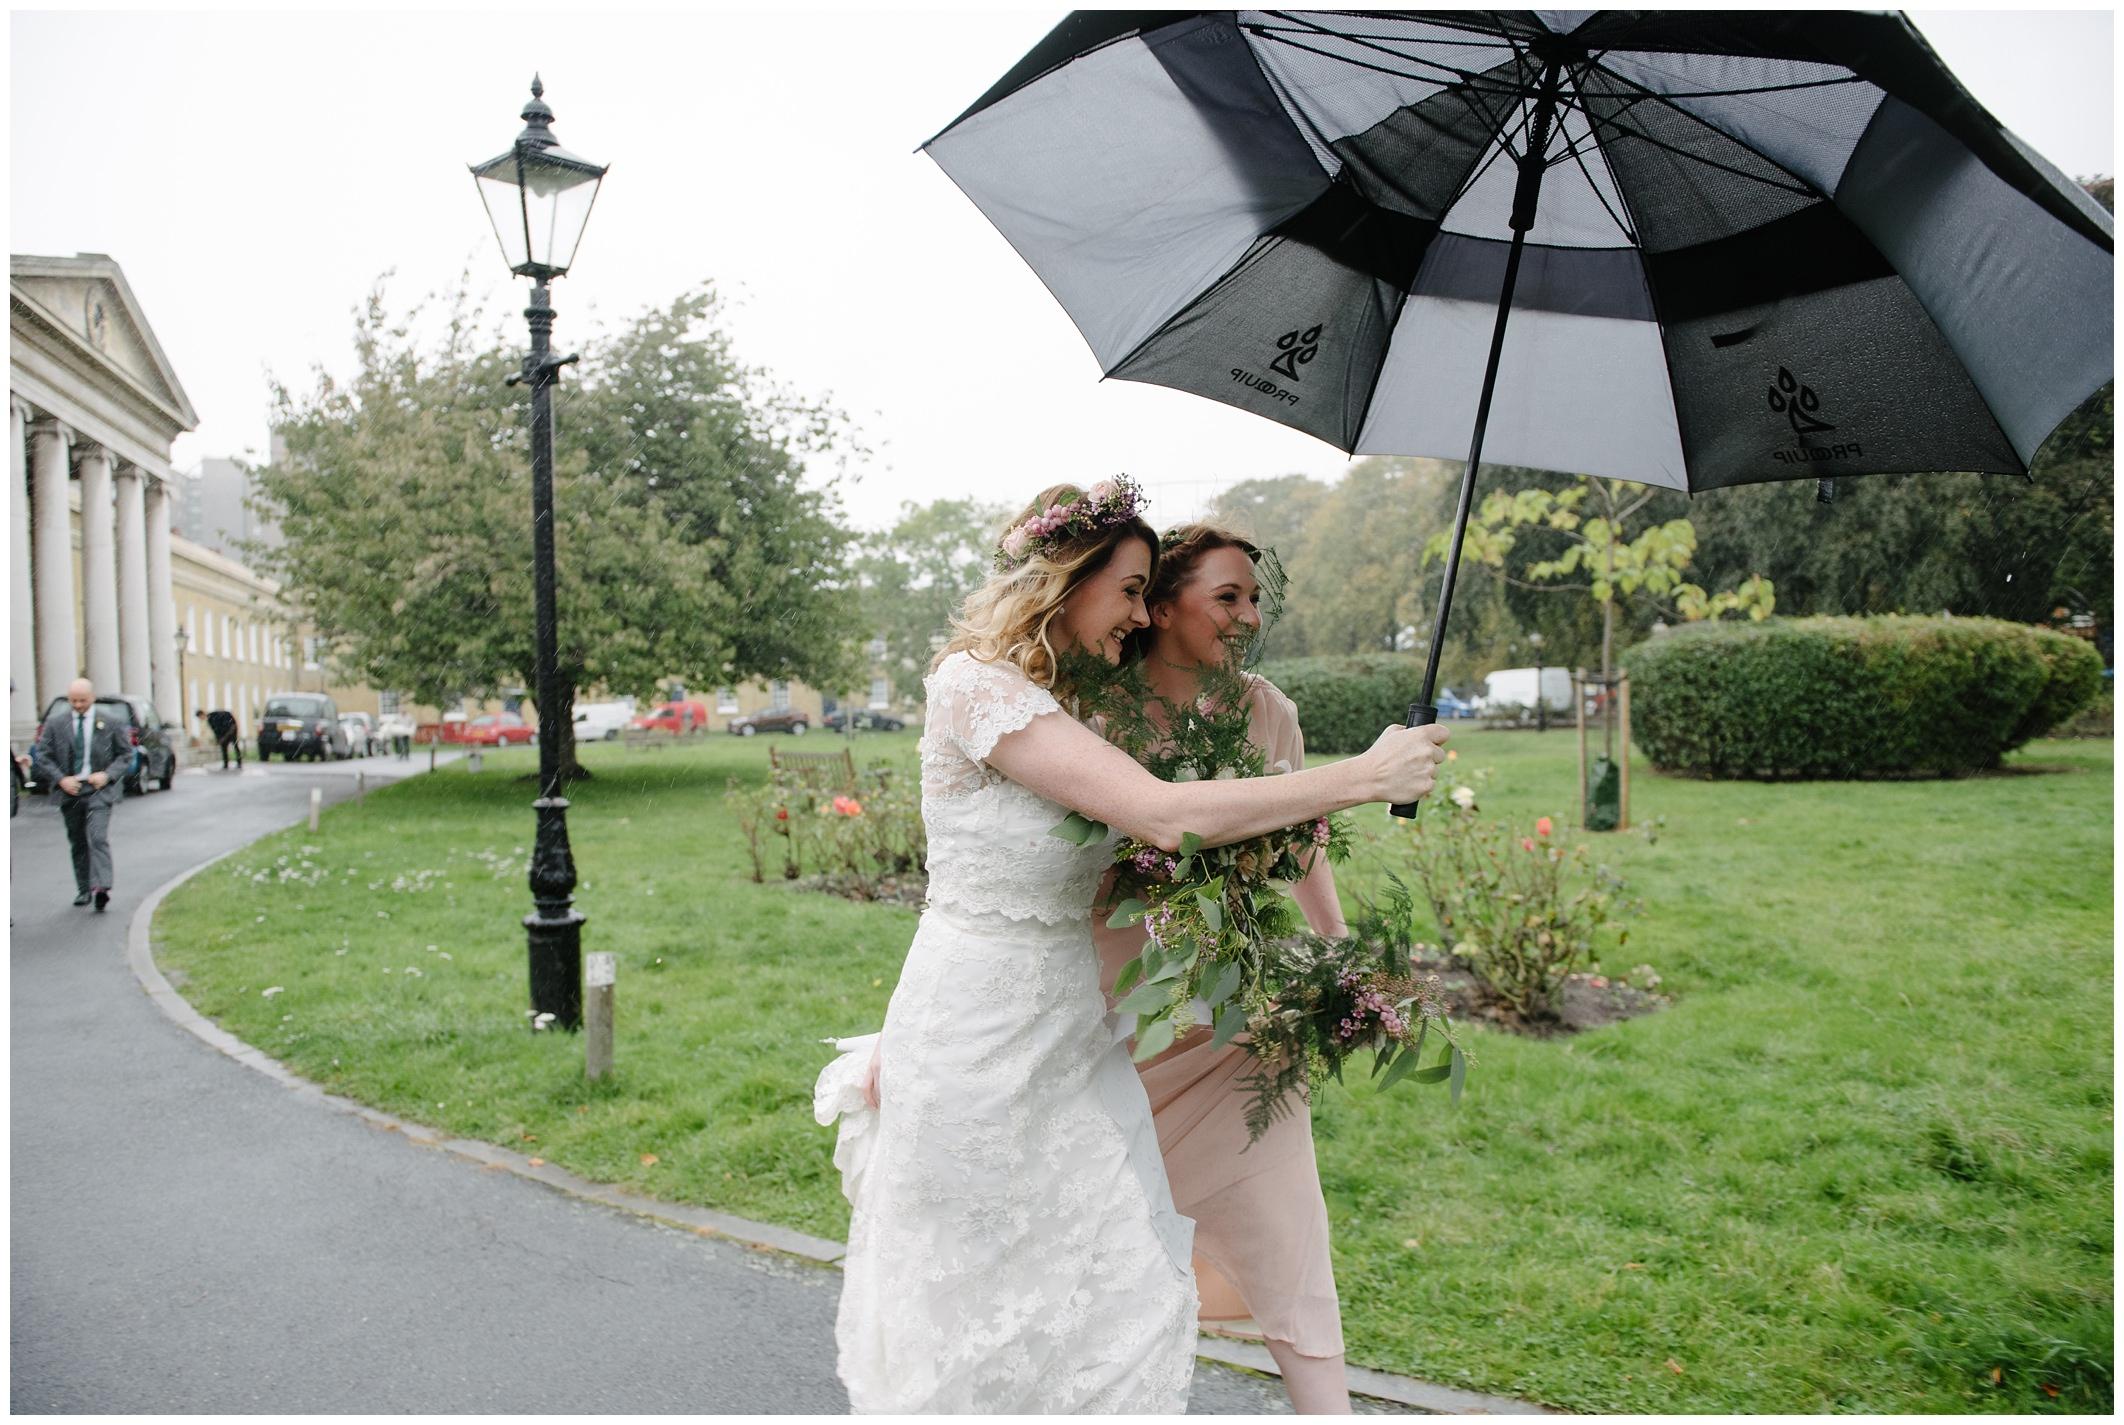 asylum_chapel_peckham_rosendale_wedding_jude_browne_photography_0121.jpg